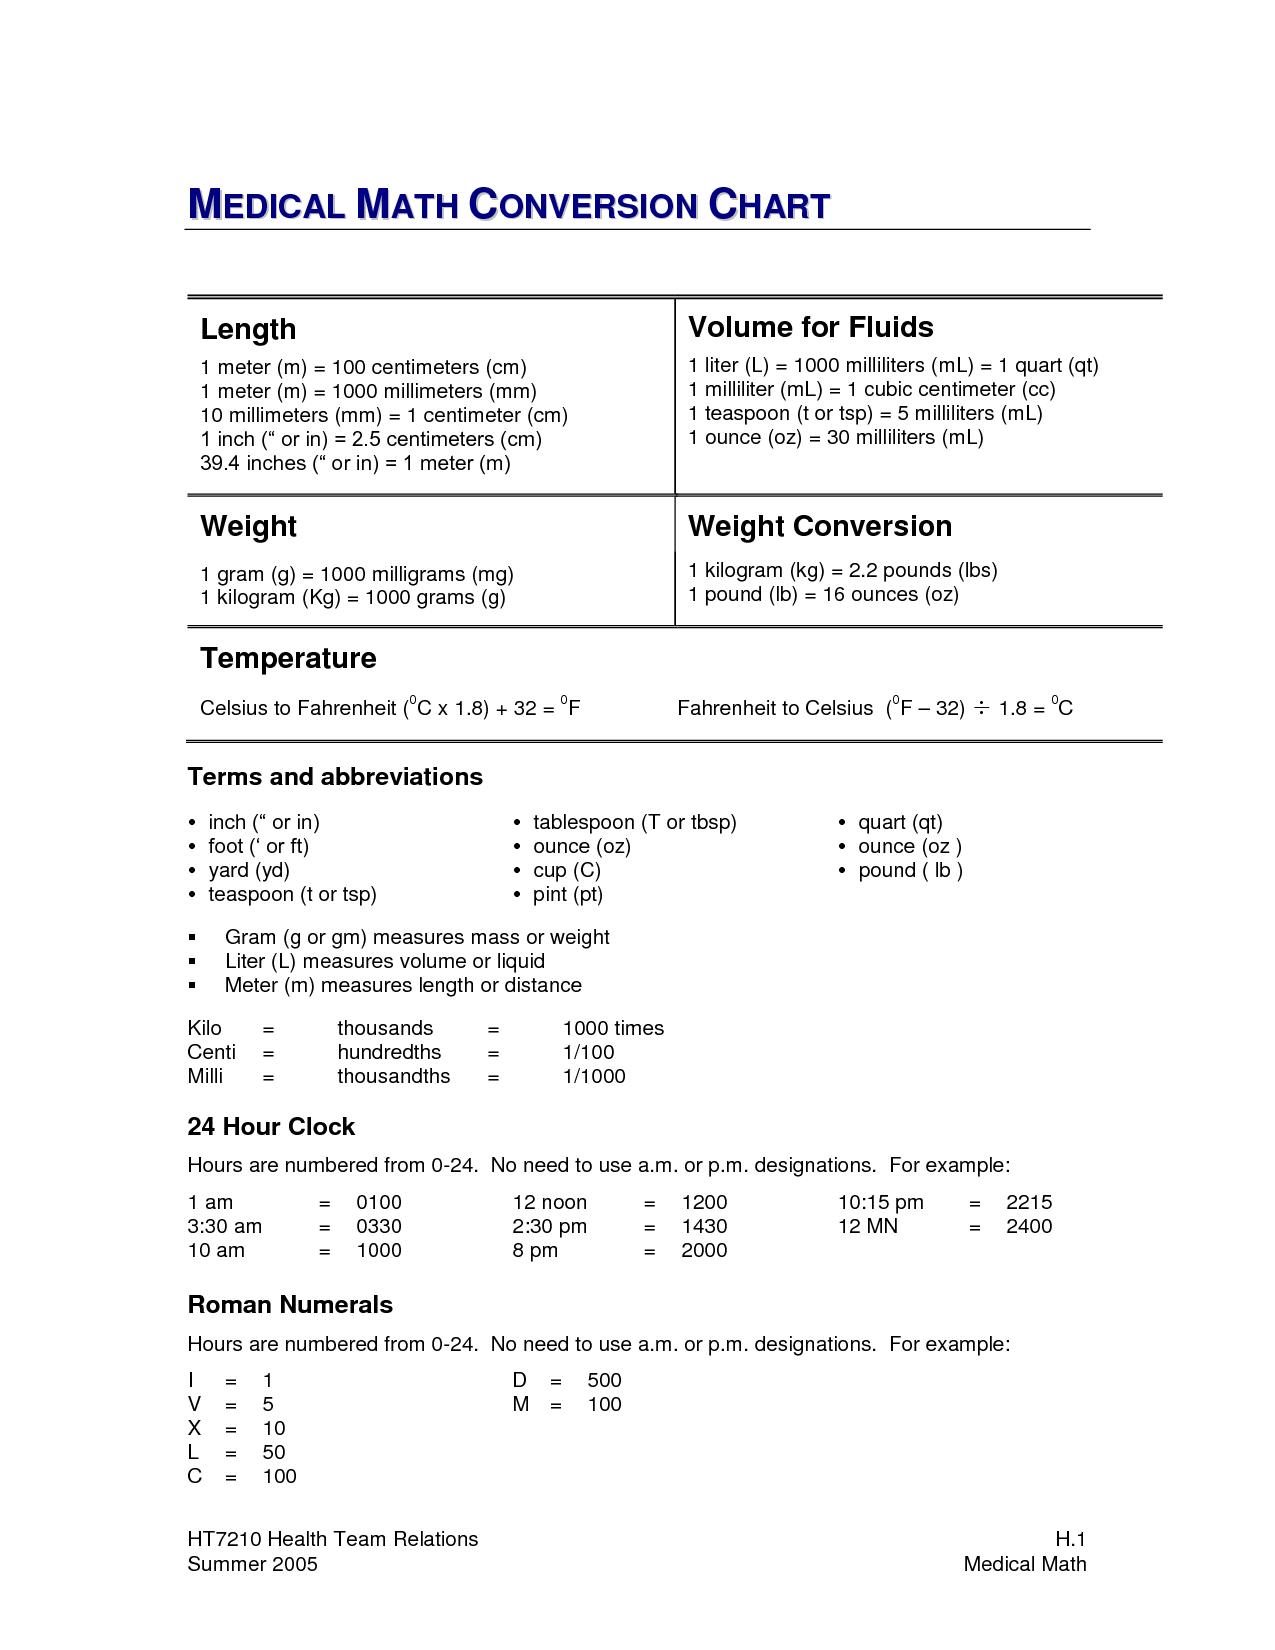 Medical Math Conversion Chart